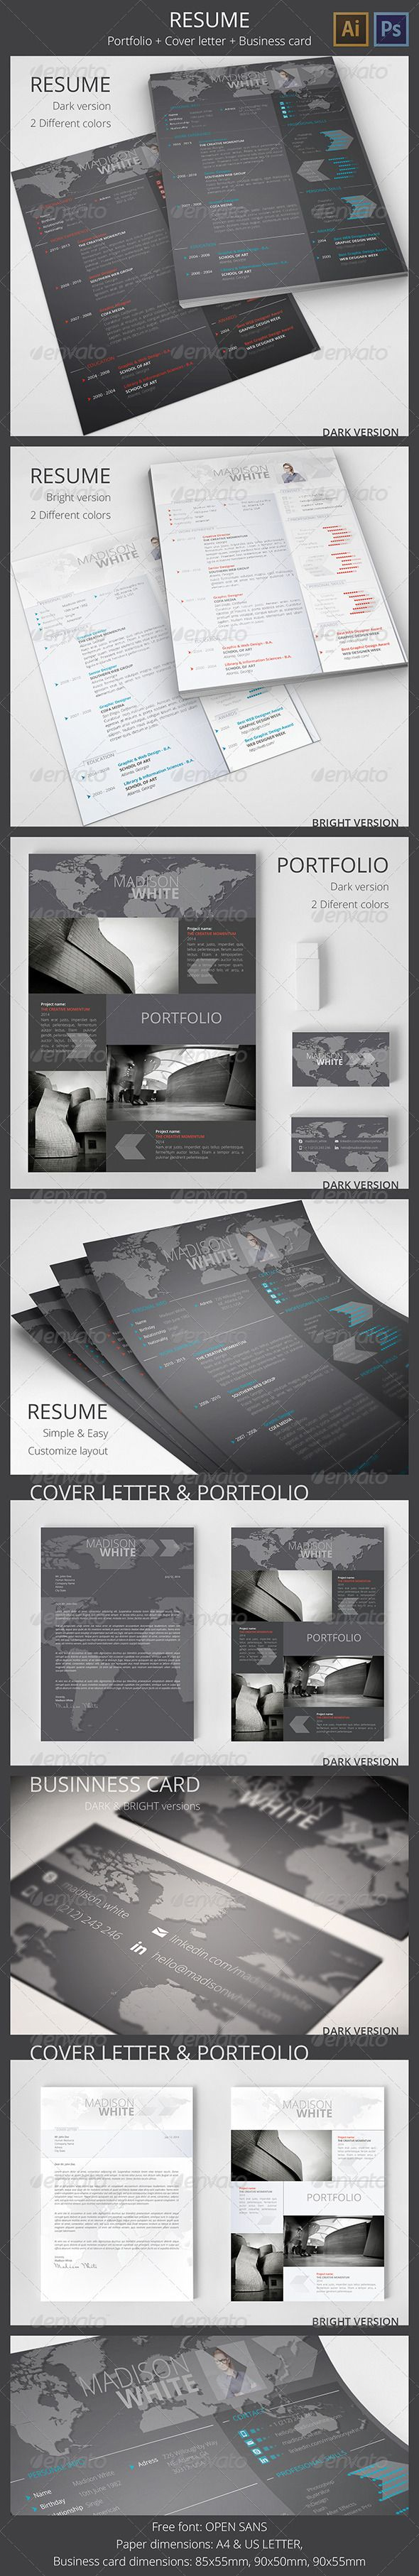 resume cover letter portfolio business card resume cover